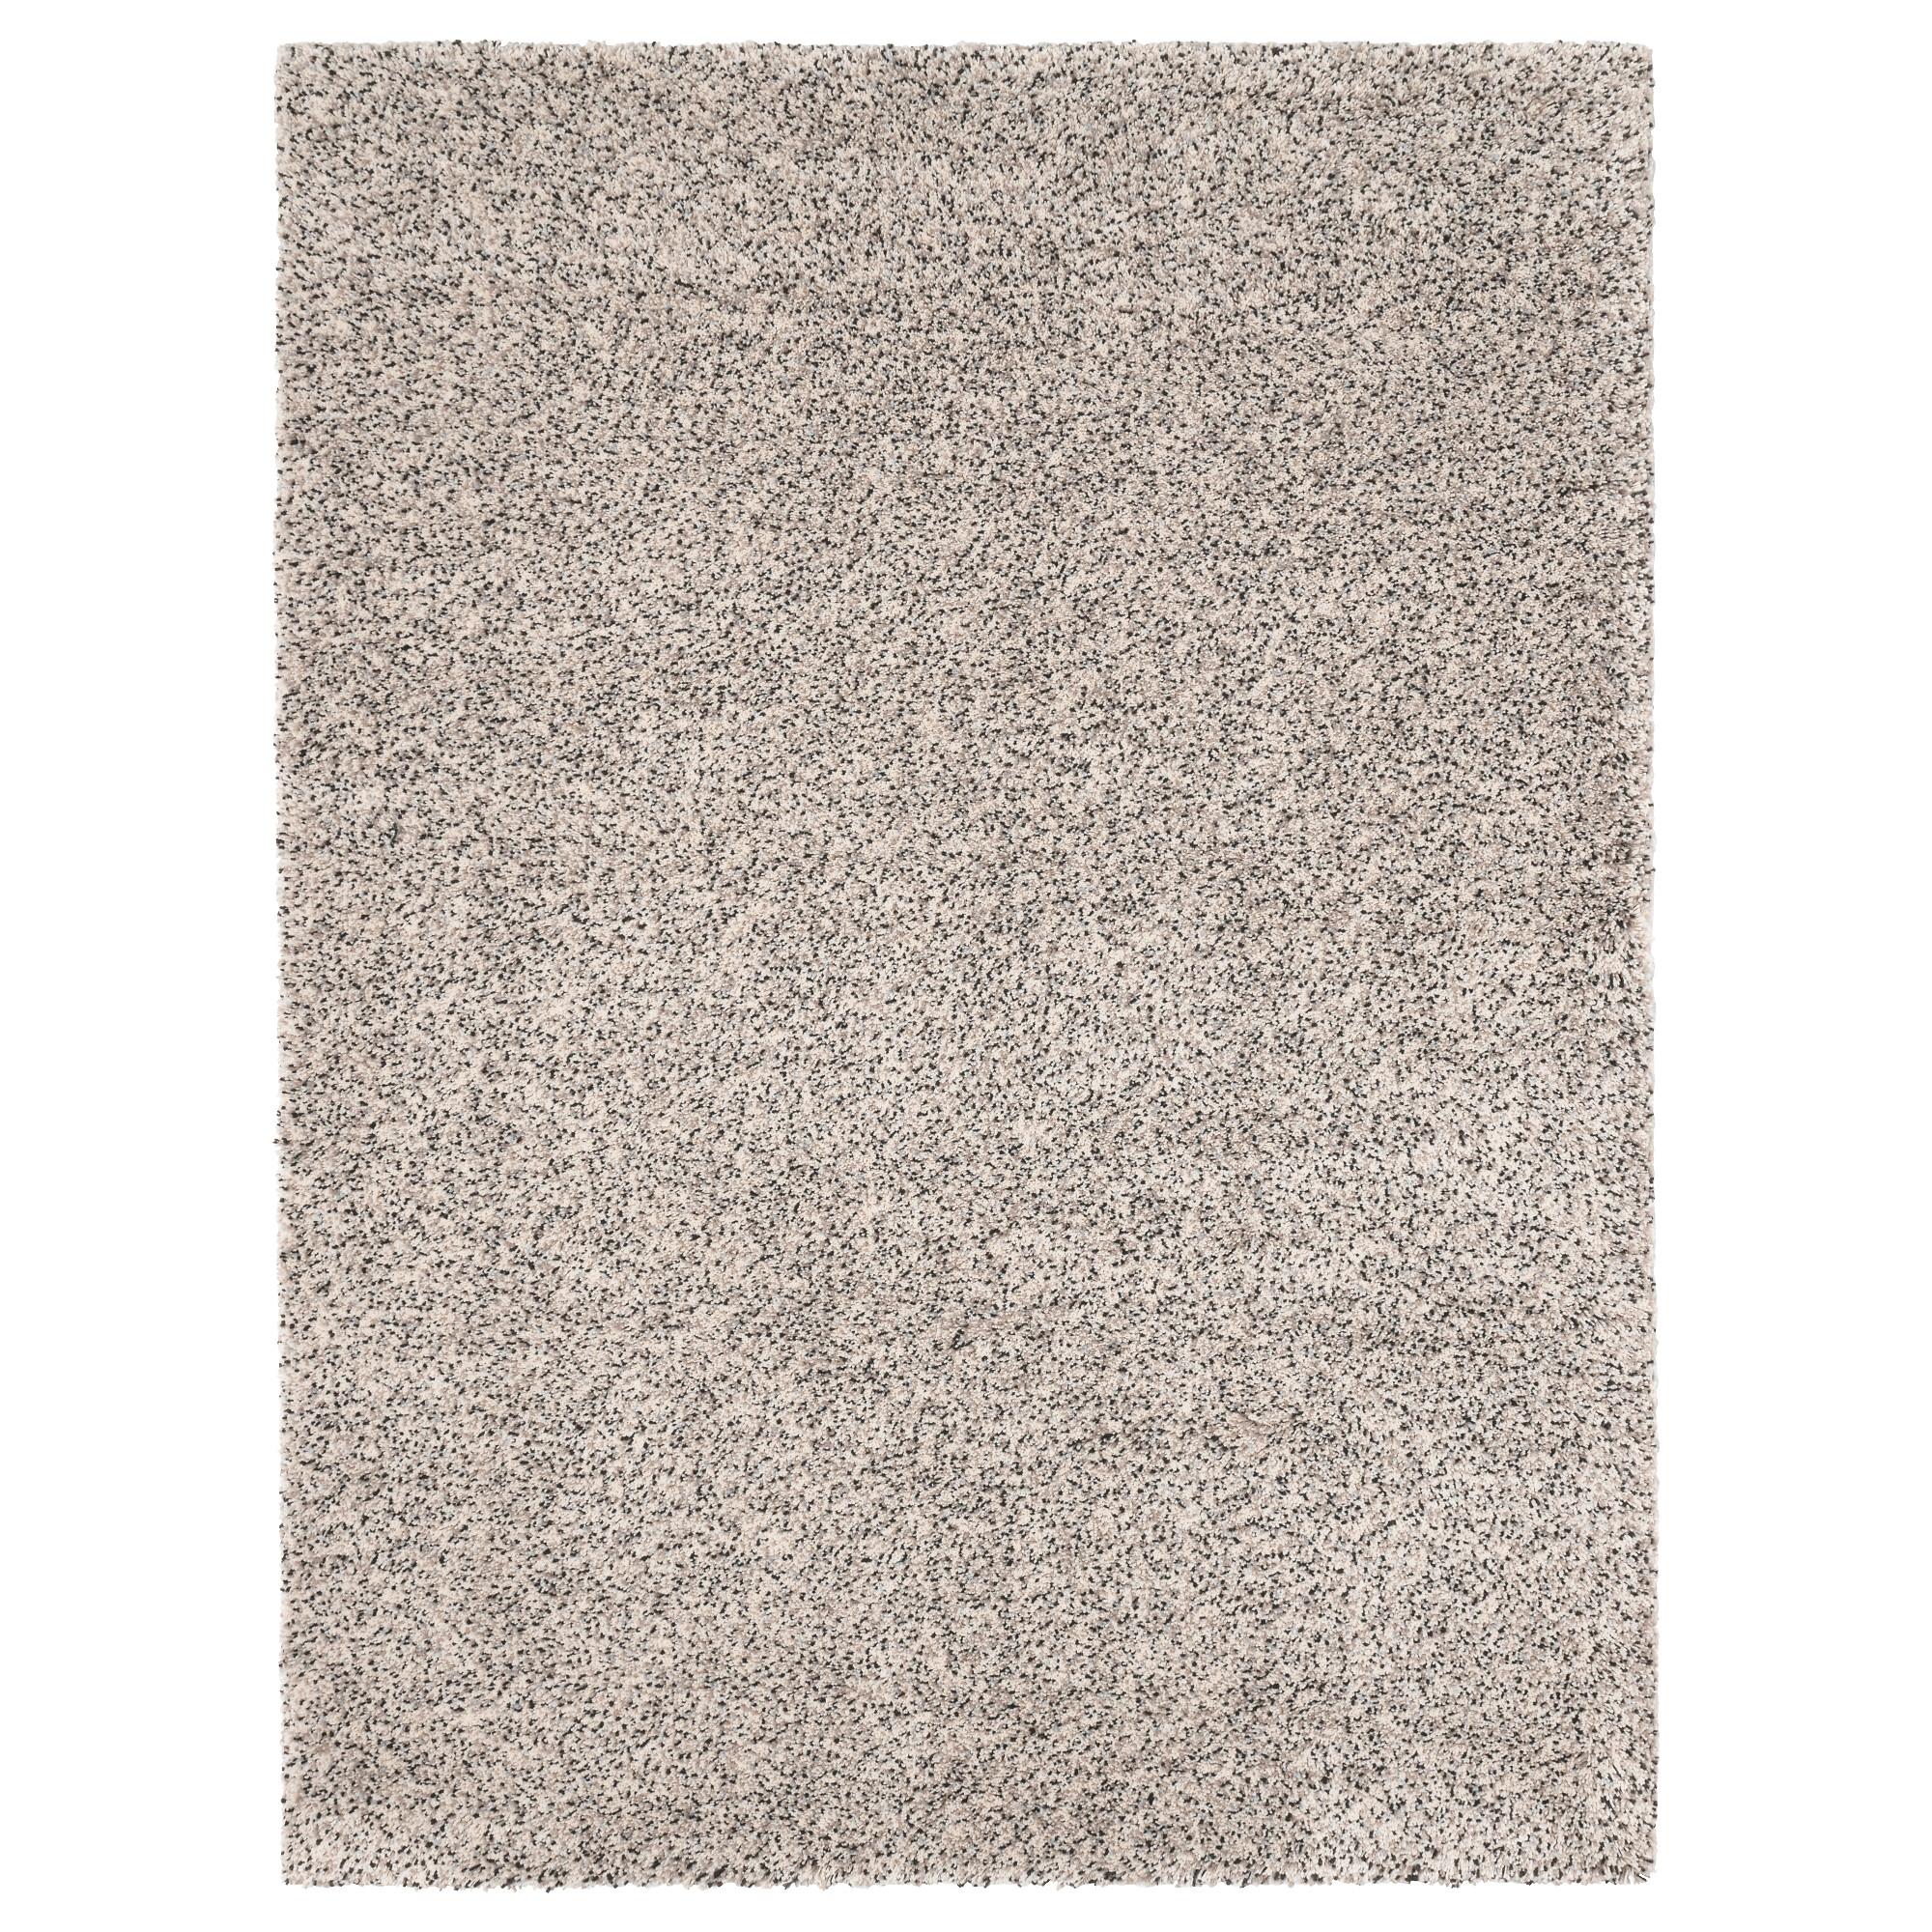 Vindum alfombra pelo largo - Ikea textiles y alfombras ...